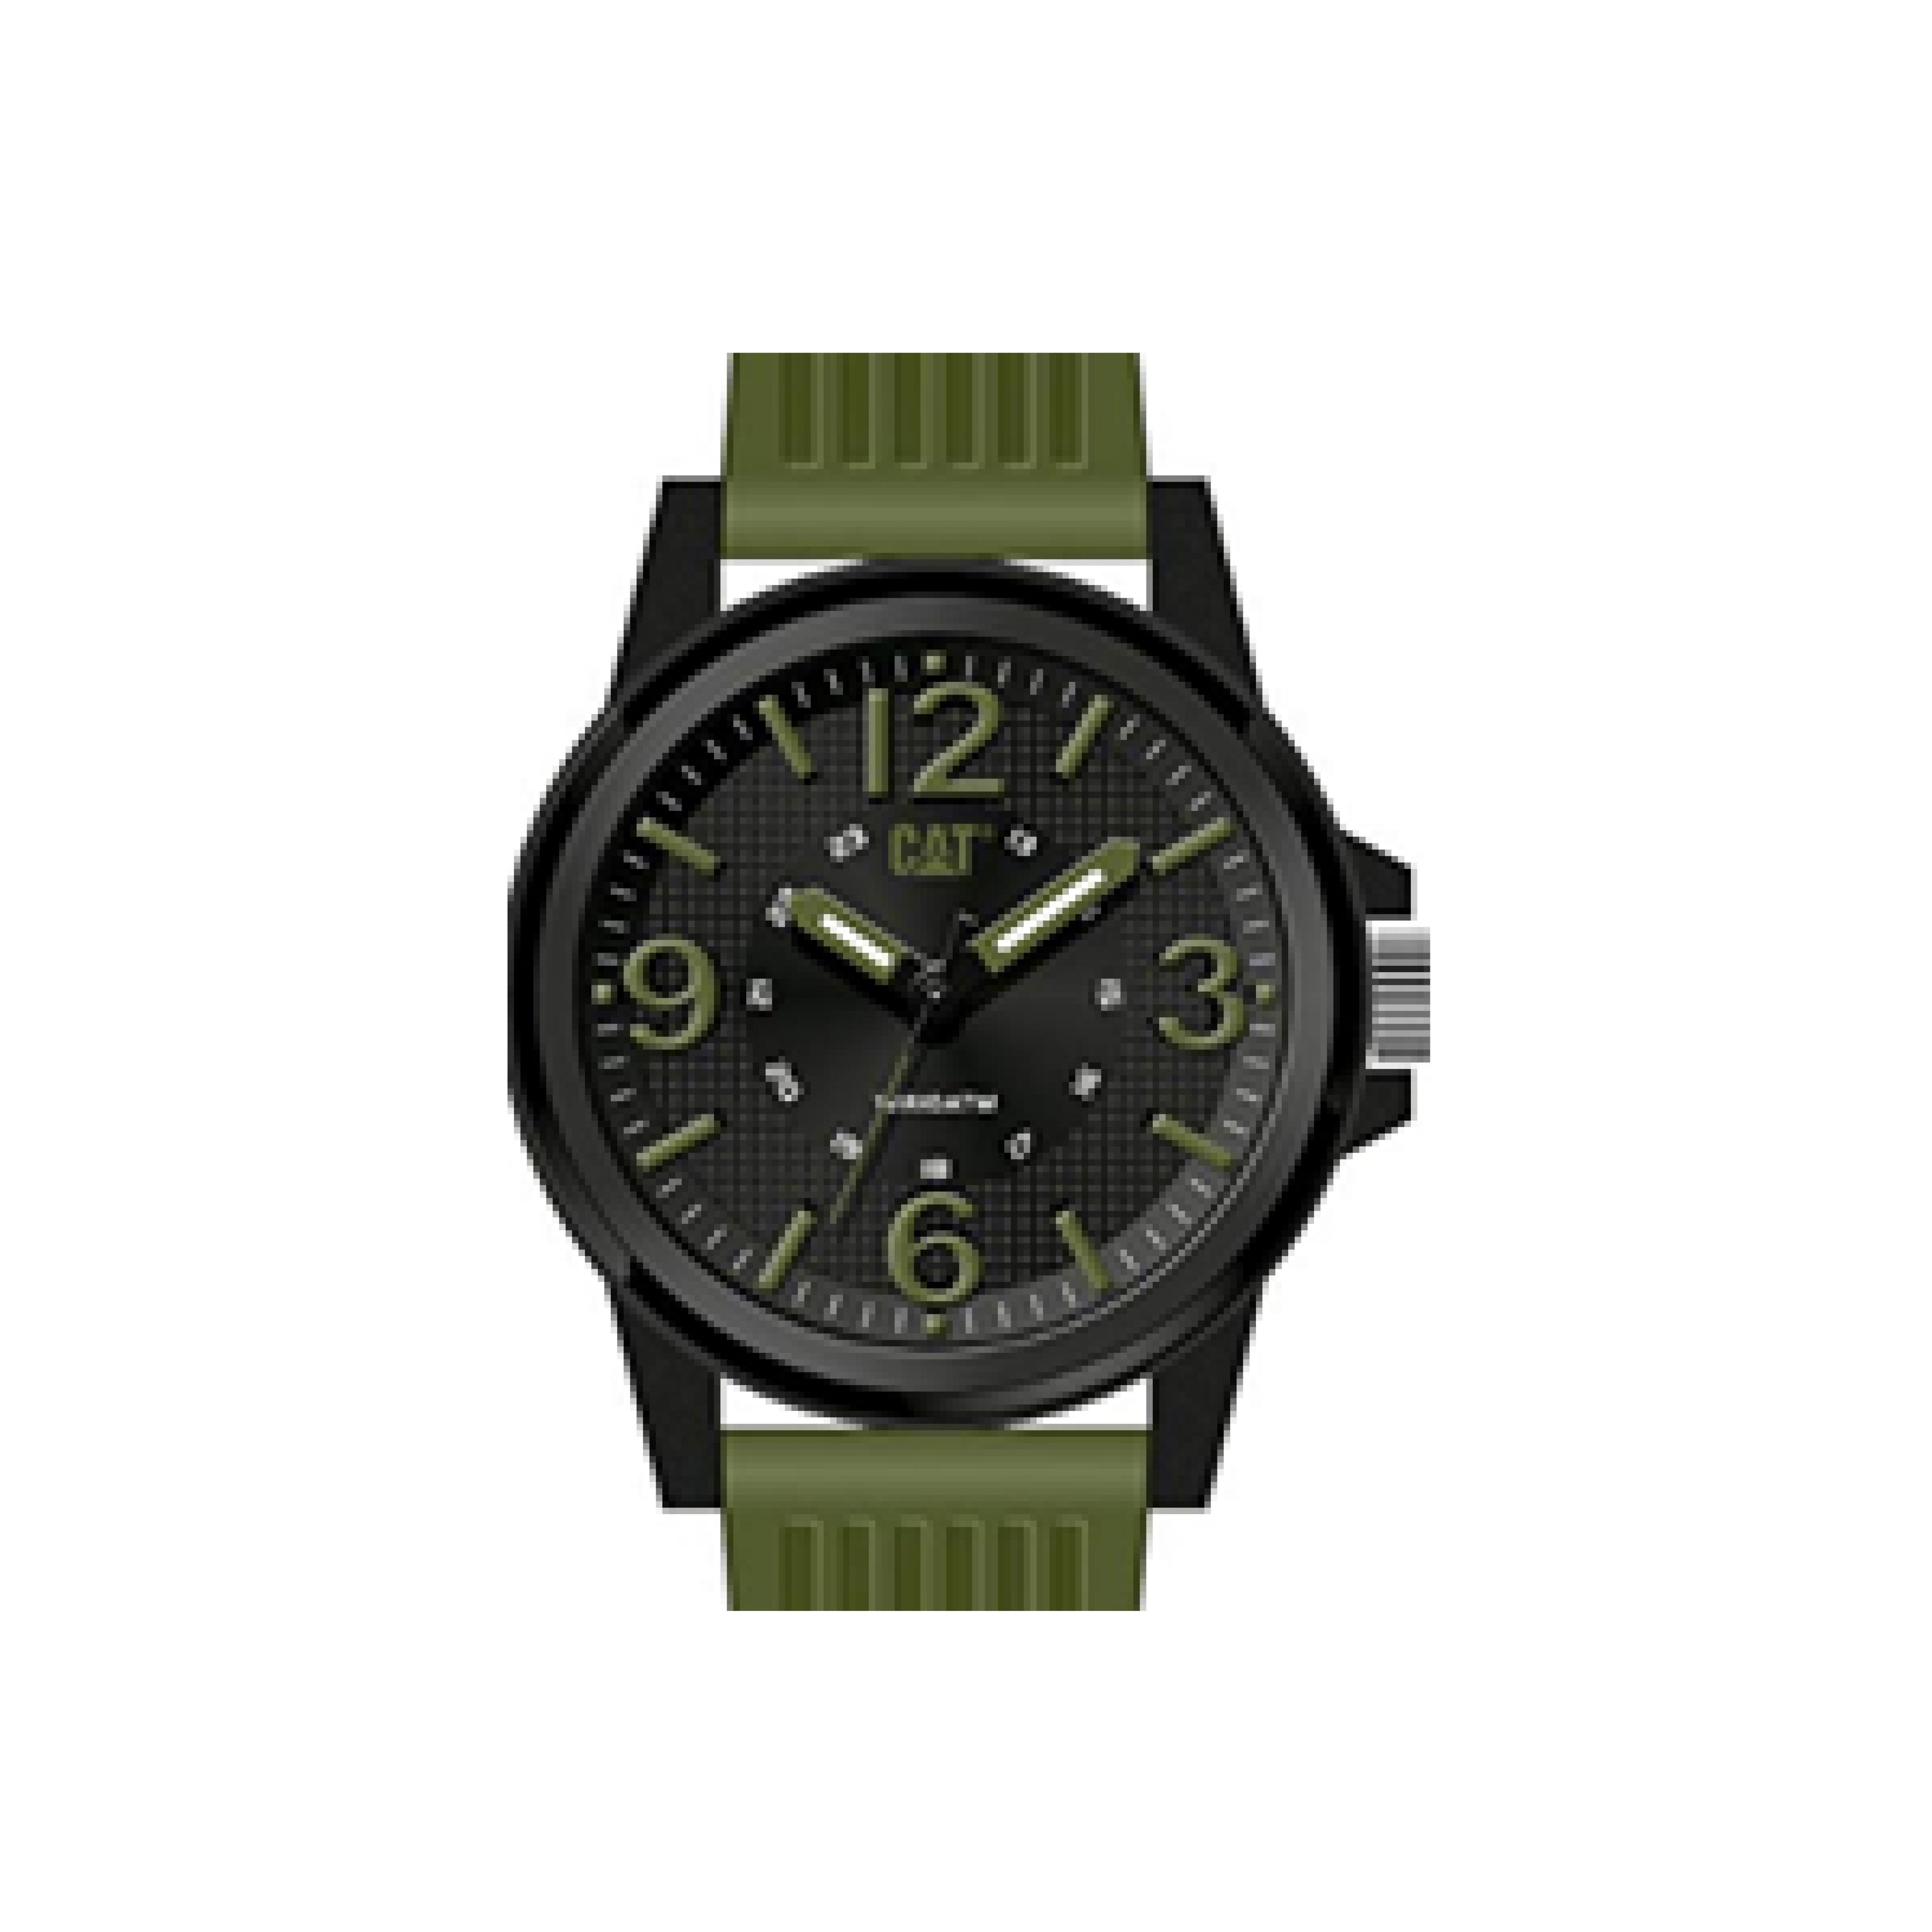 CAT-Black-Green-GS-1.jpg